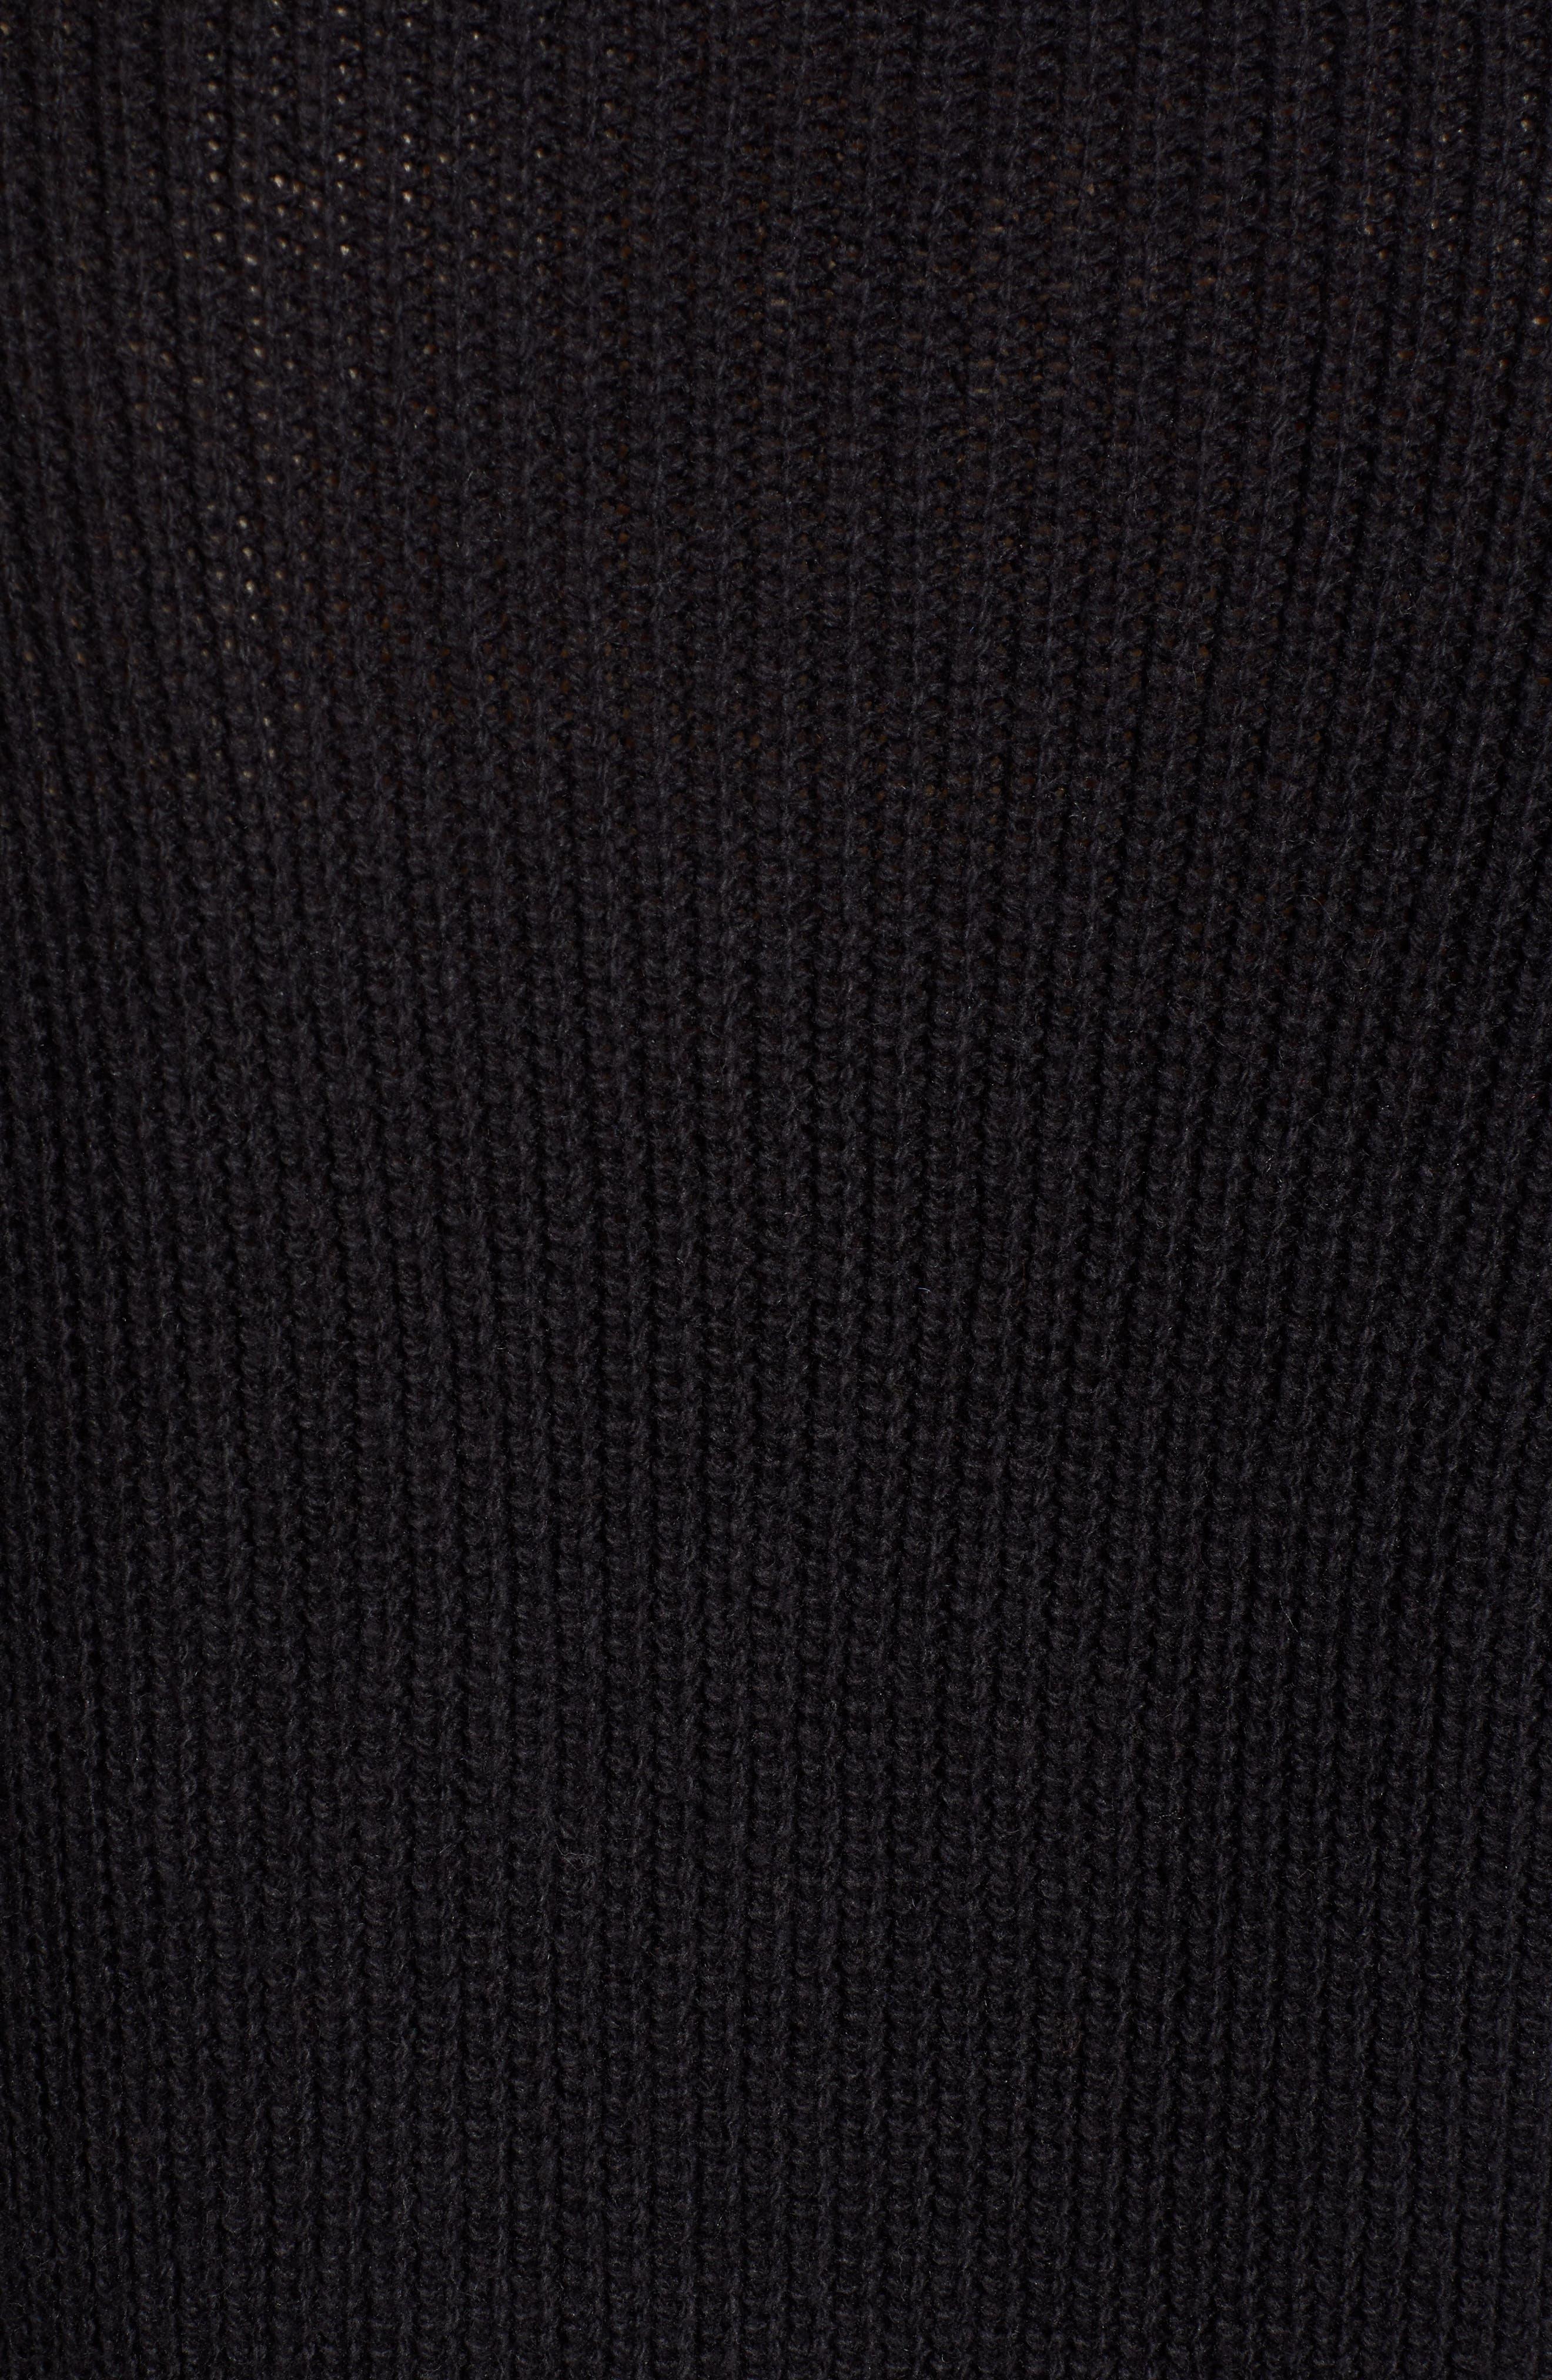 BP.,                             Cowl Neck Sweater Dress,                             Alternate thumbnail 6, color,                             001